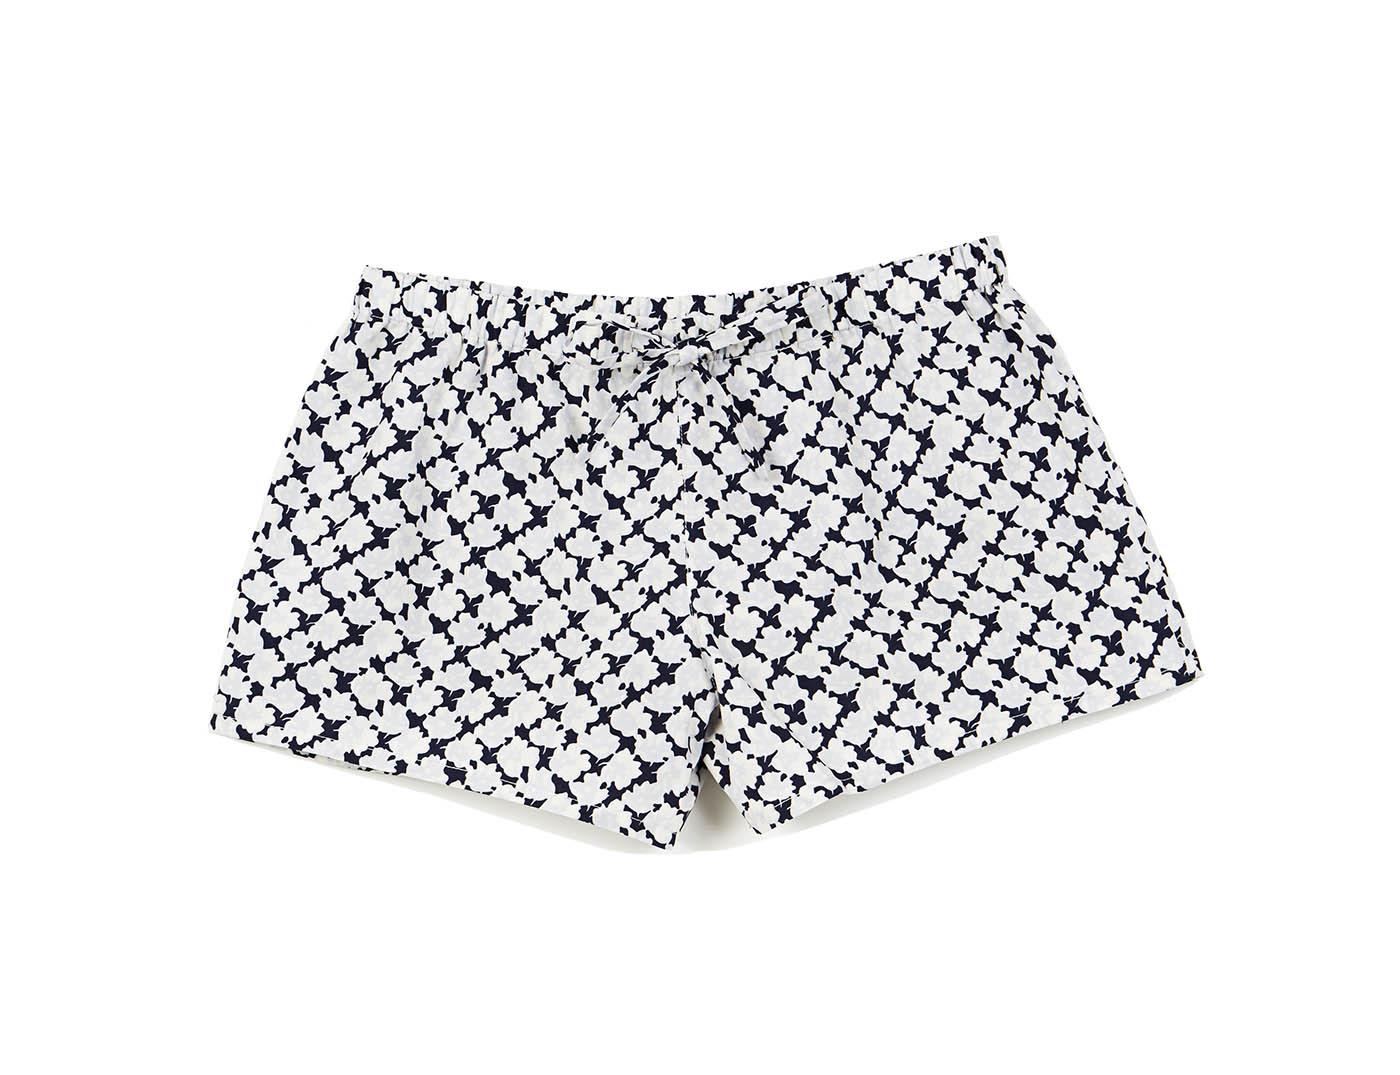 Sleepy Jones Marina Pajama short pants